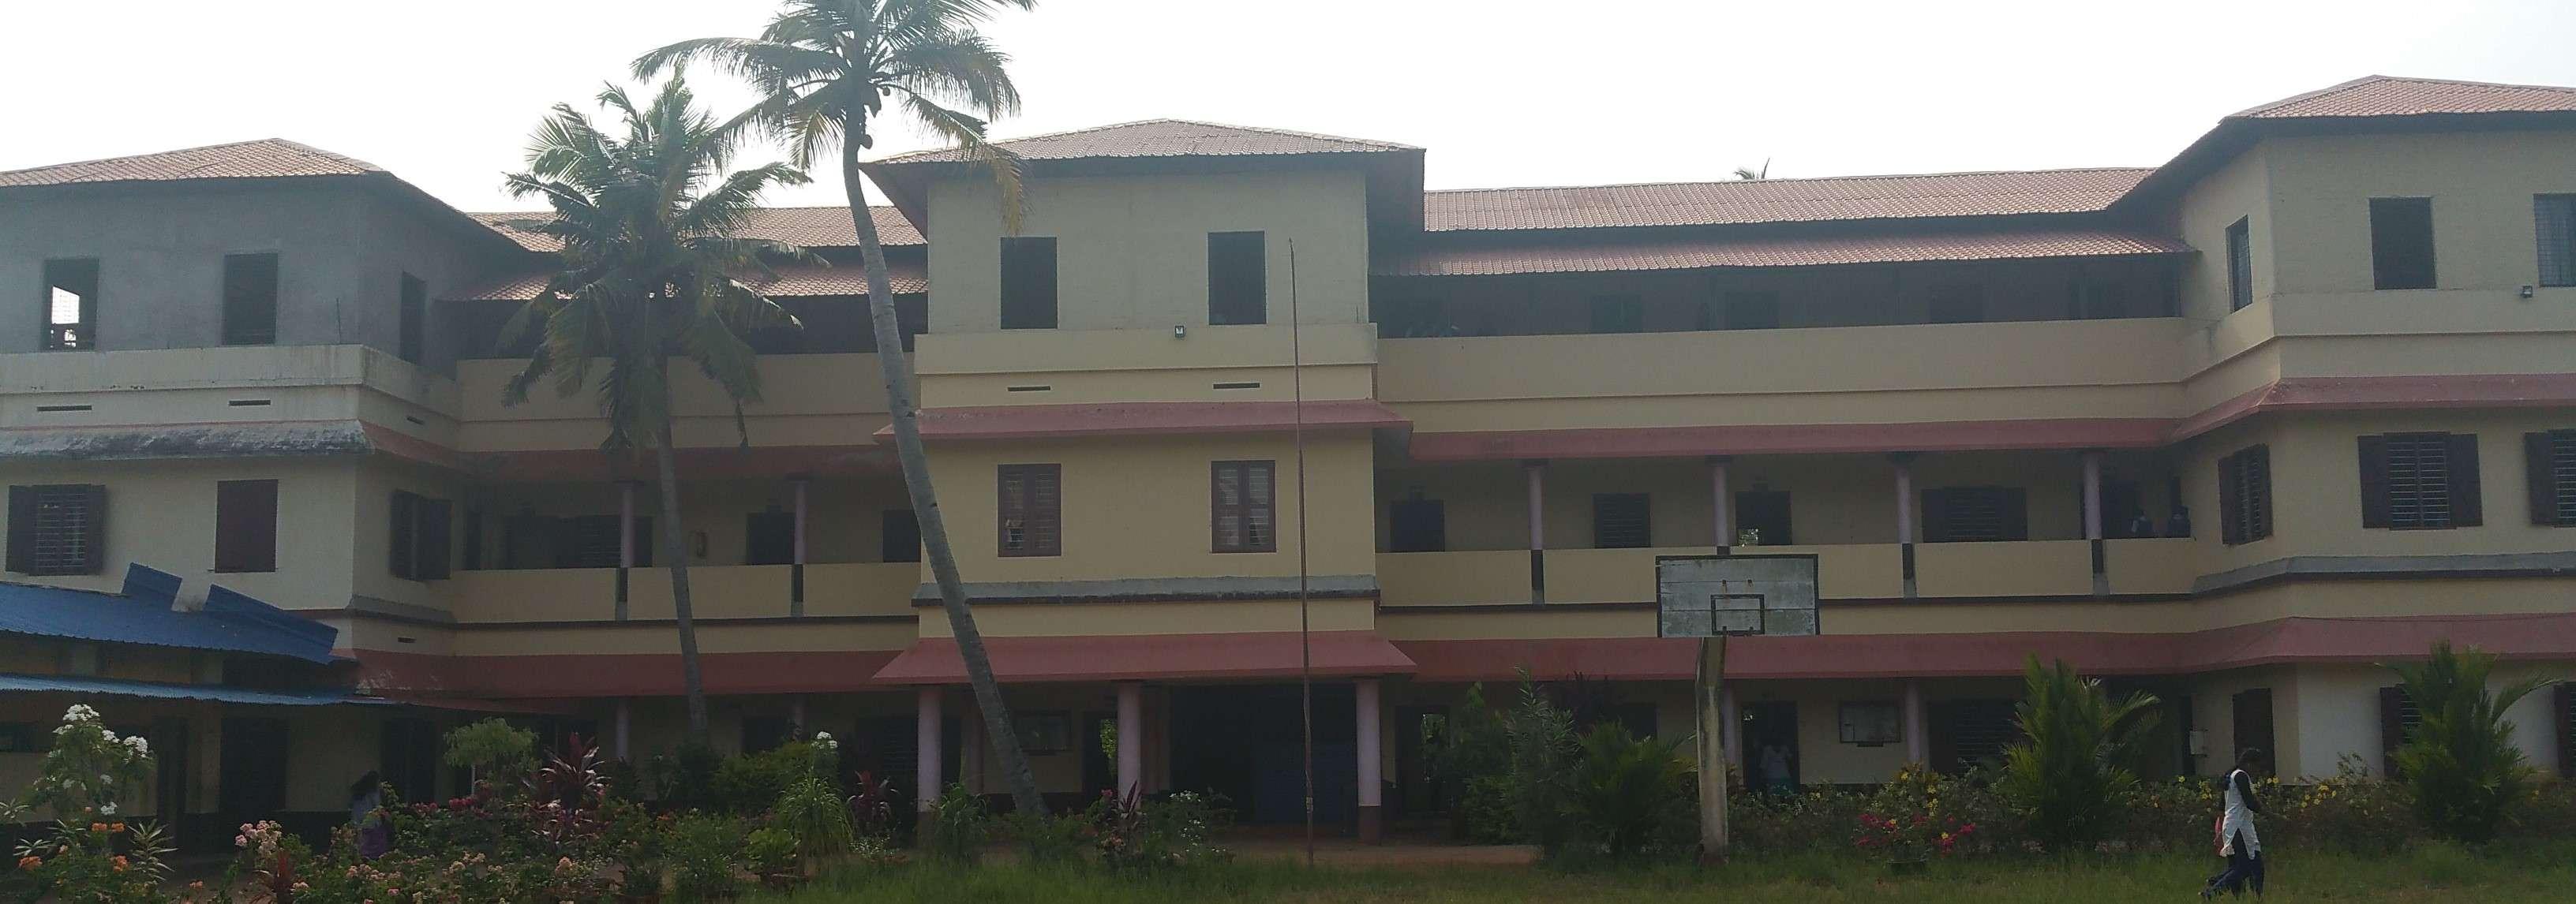 S S V M RESIDENTIAL CENTRAL SCHOOL VETTATHUKADAVU MUTHUKULAM SOUTH PO ALAPPUZHA KERALA 930491